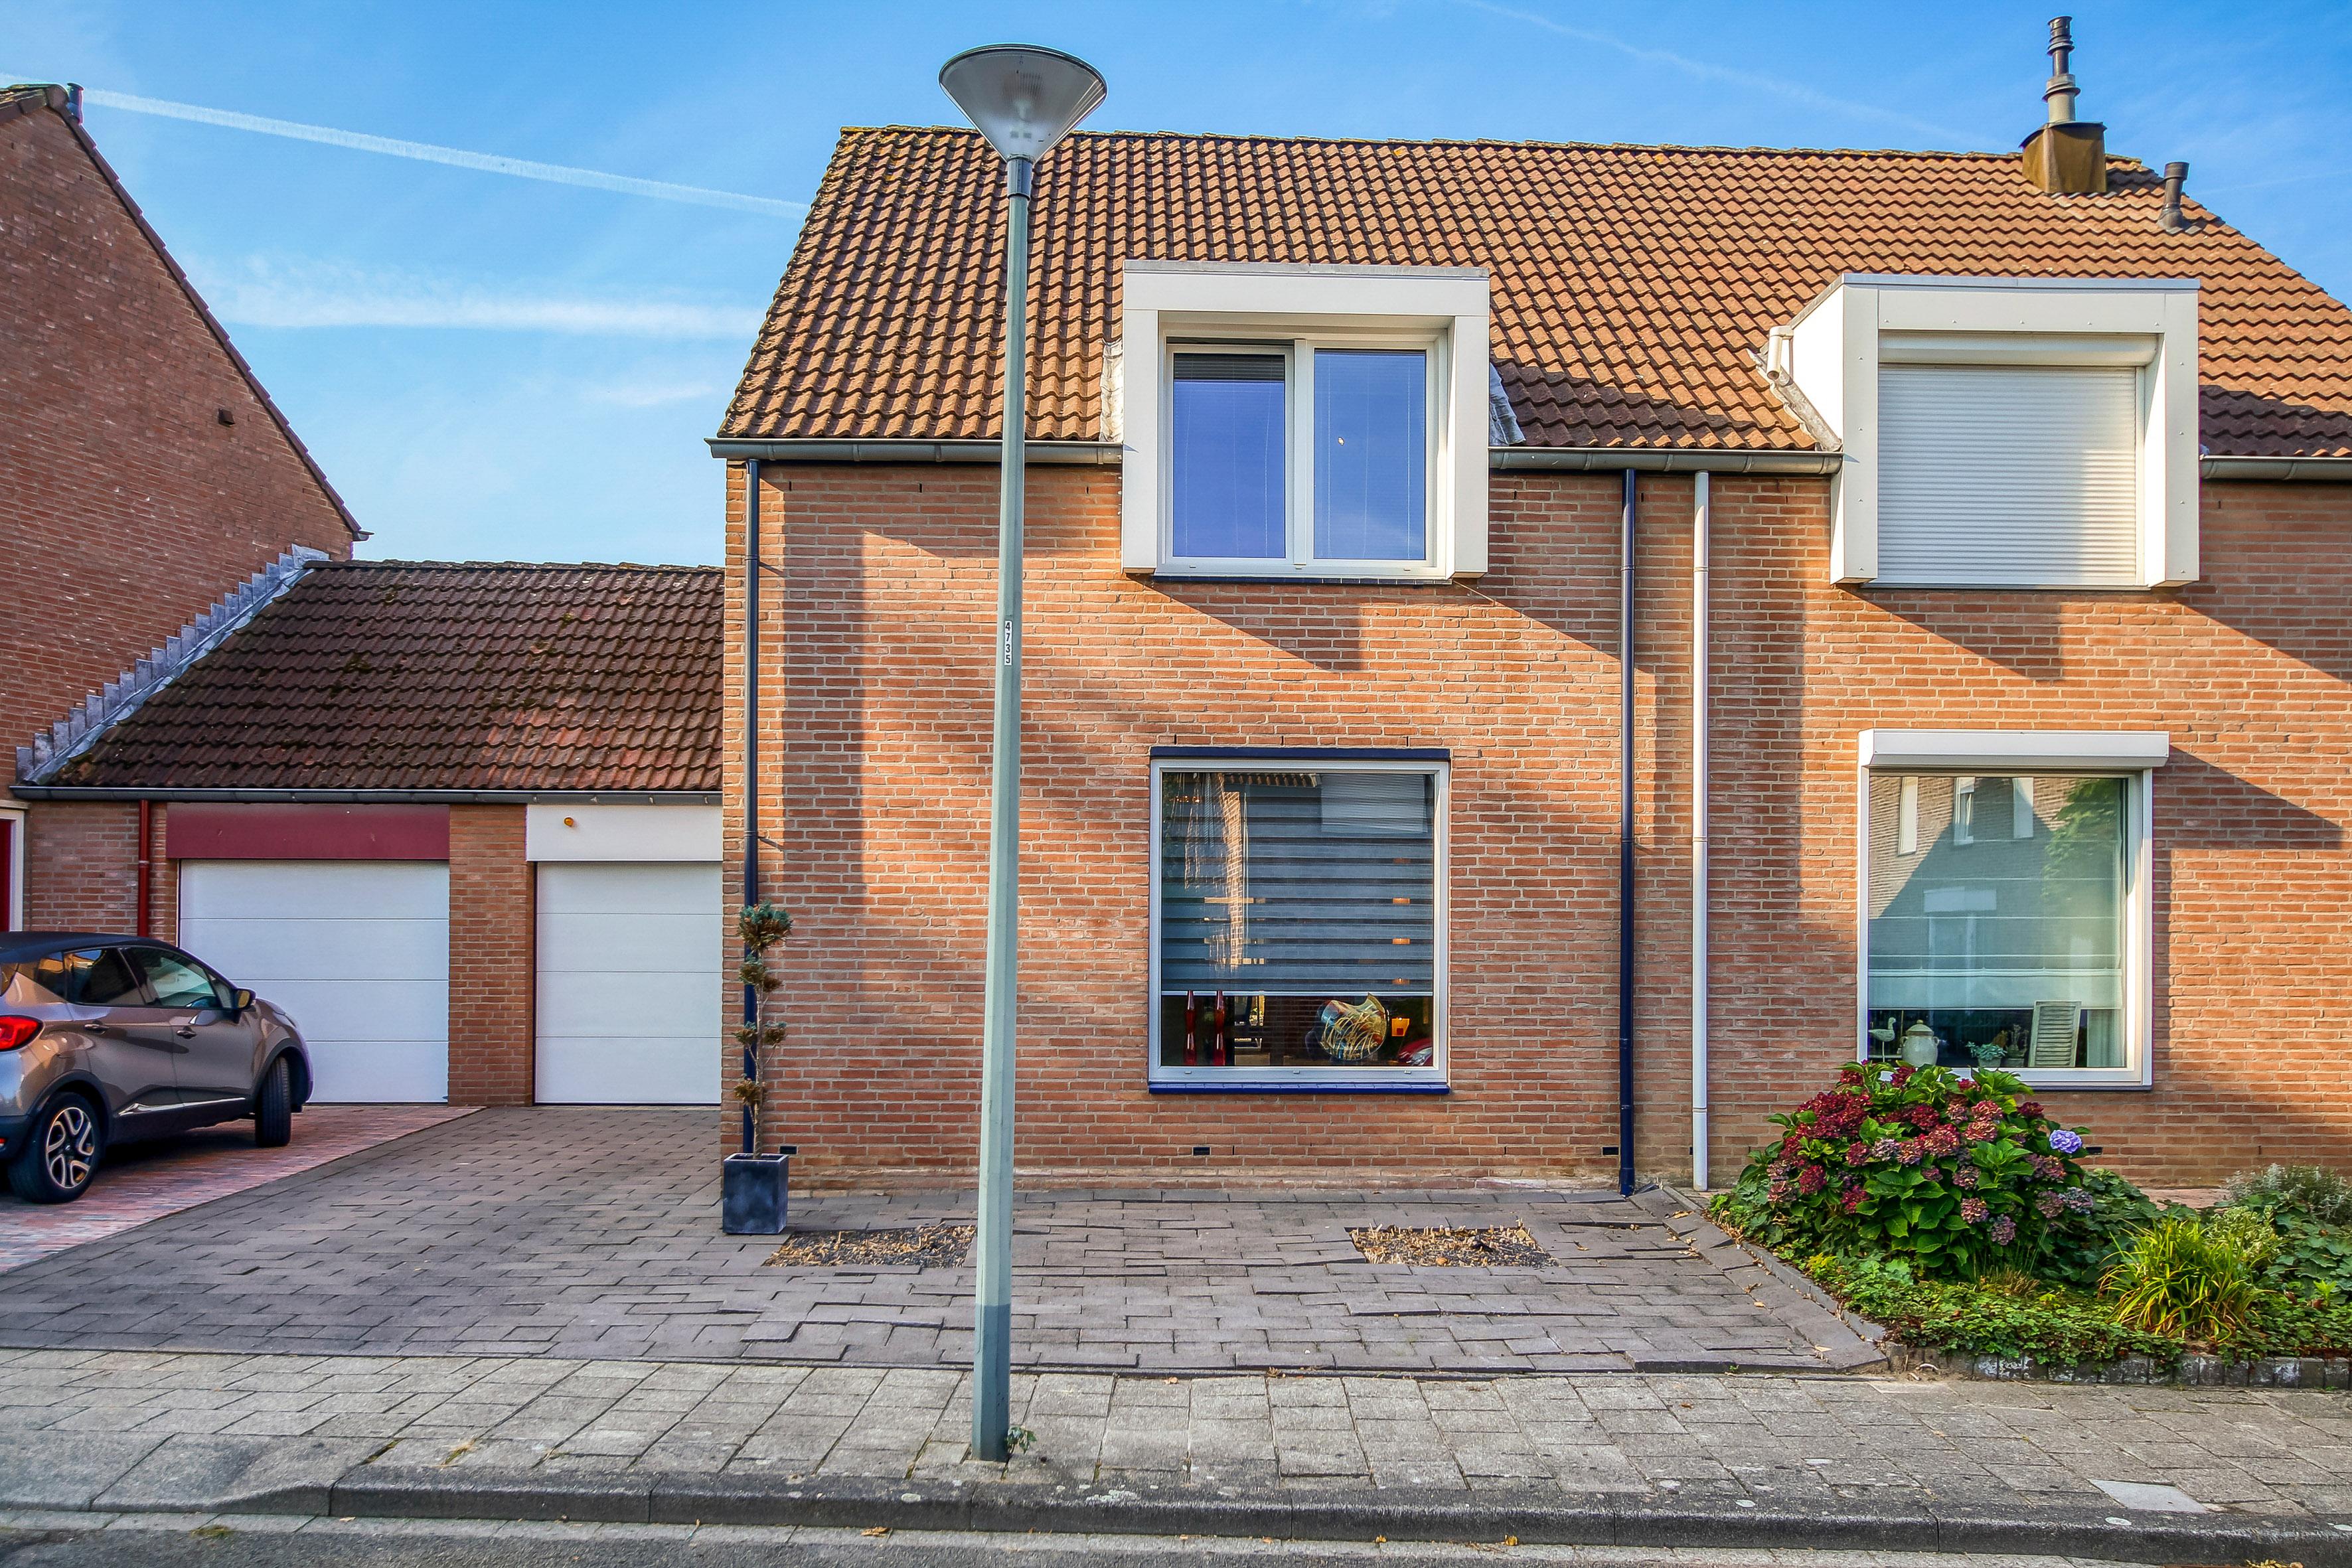 House for sale De Leu 4 a Oirsbeek